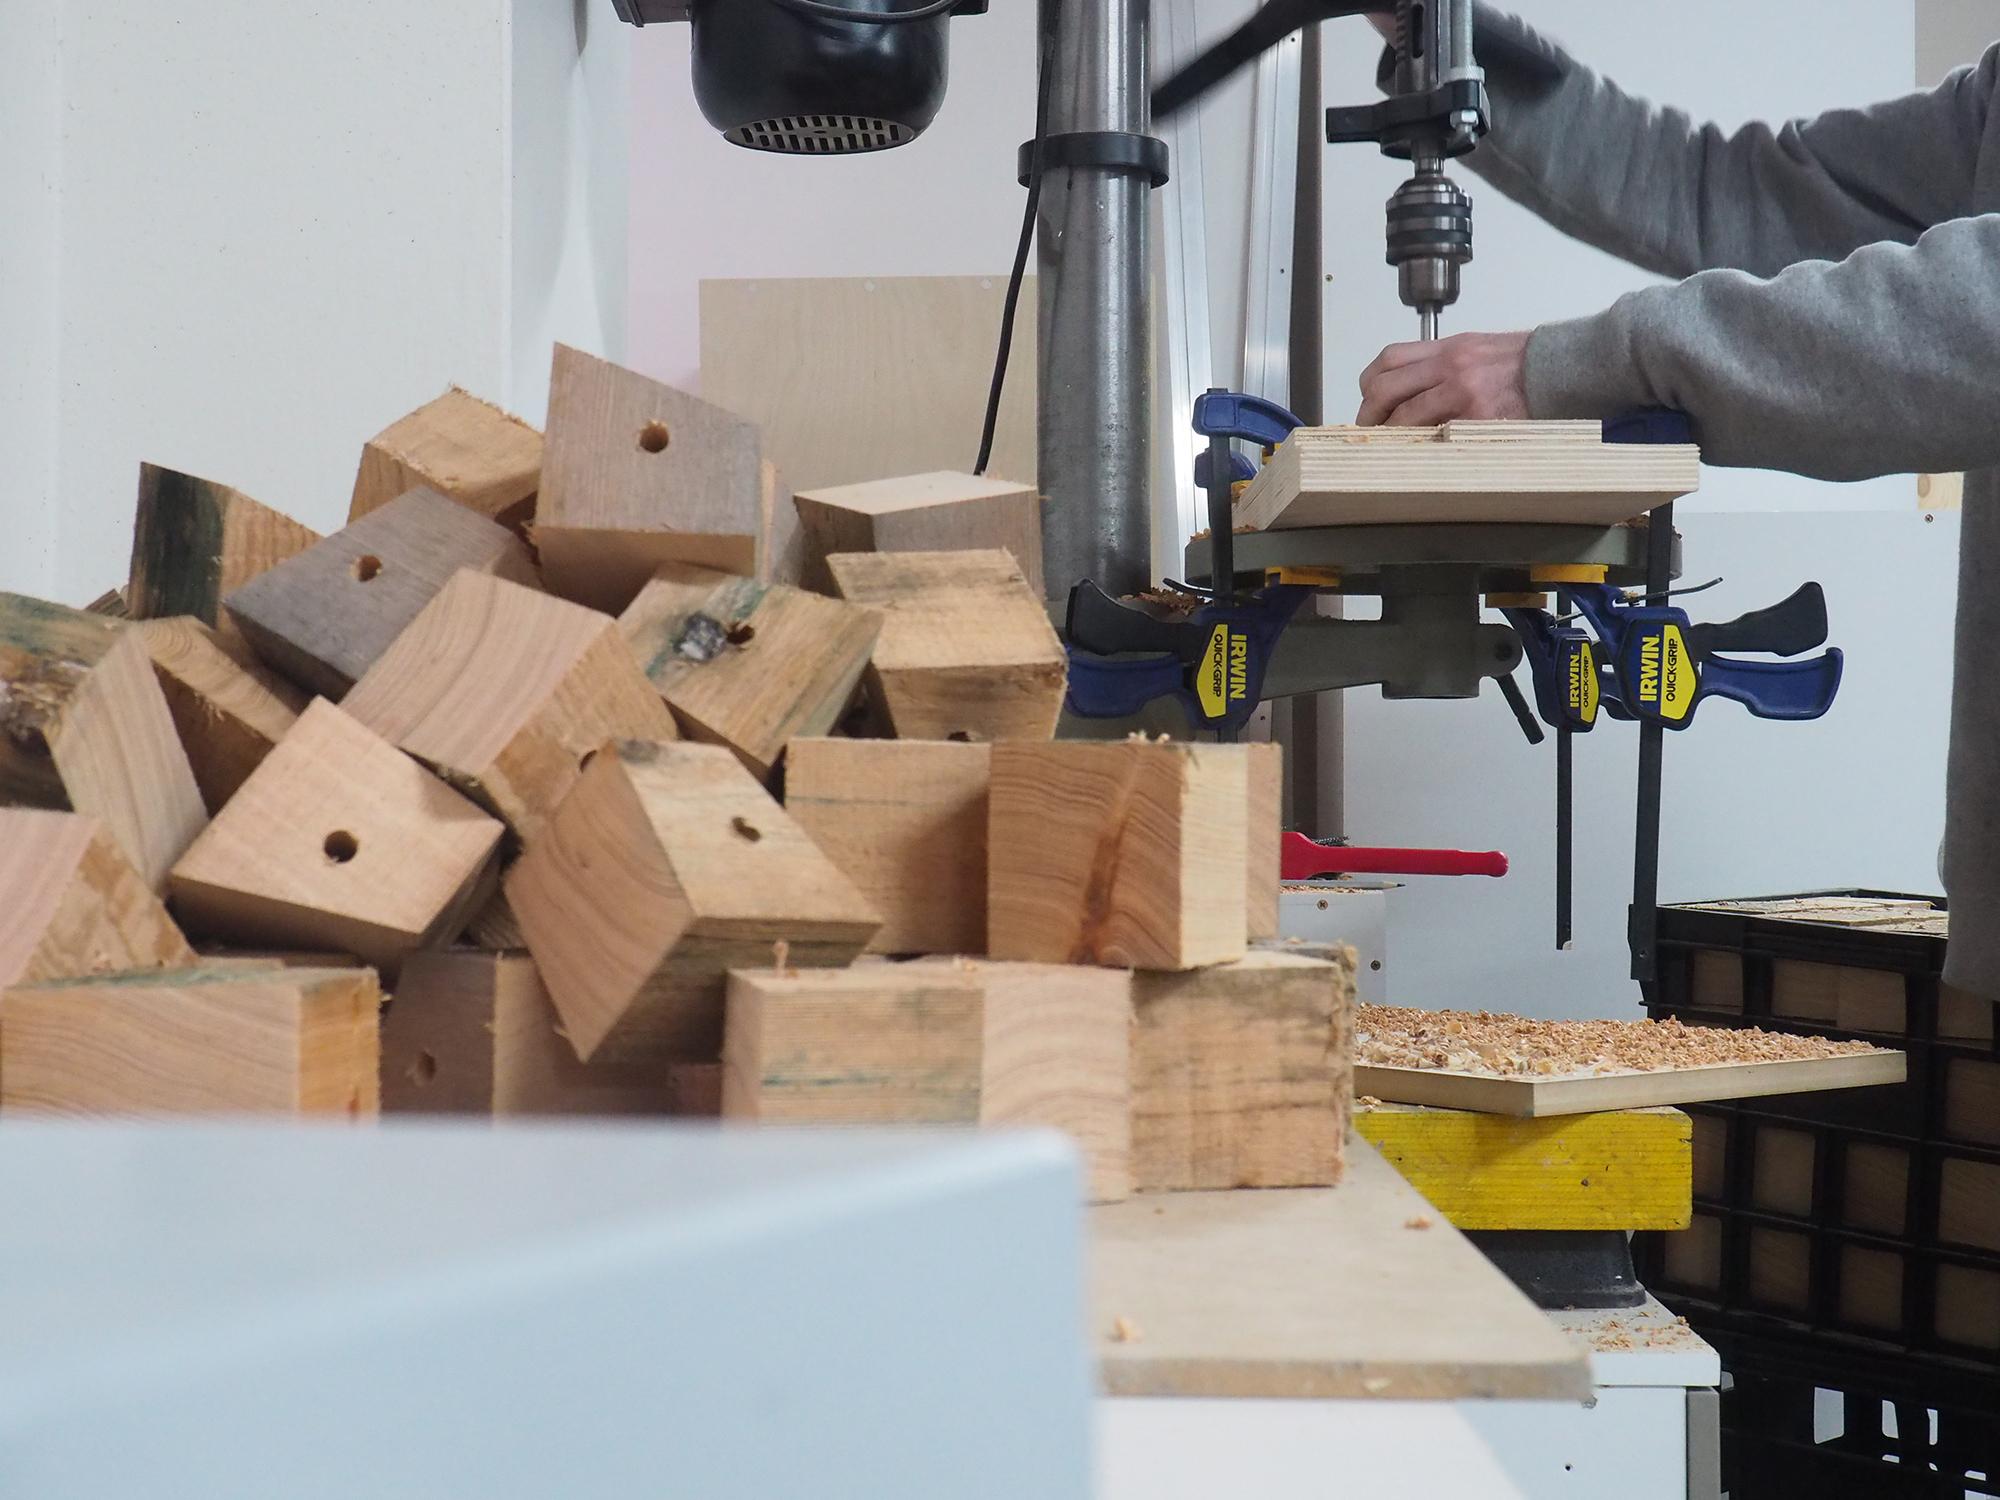 SoWatt-WIP-Sculpture-Corporate-Art-Timber-Oregon-Steel-Copper-Deloitte-04.JPG